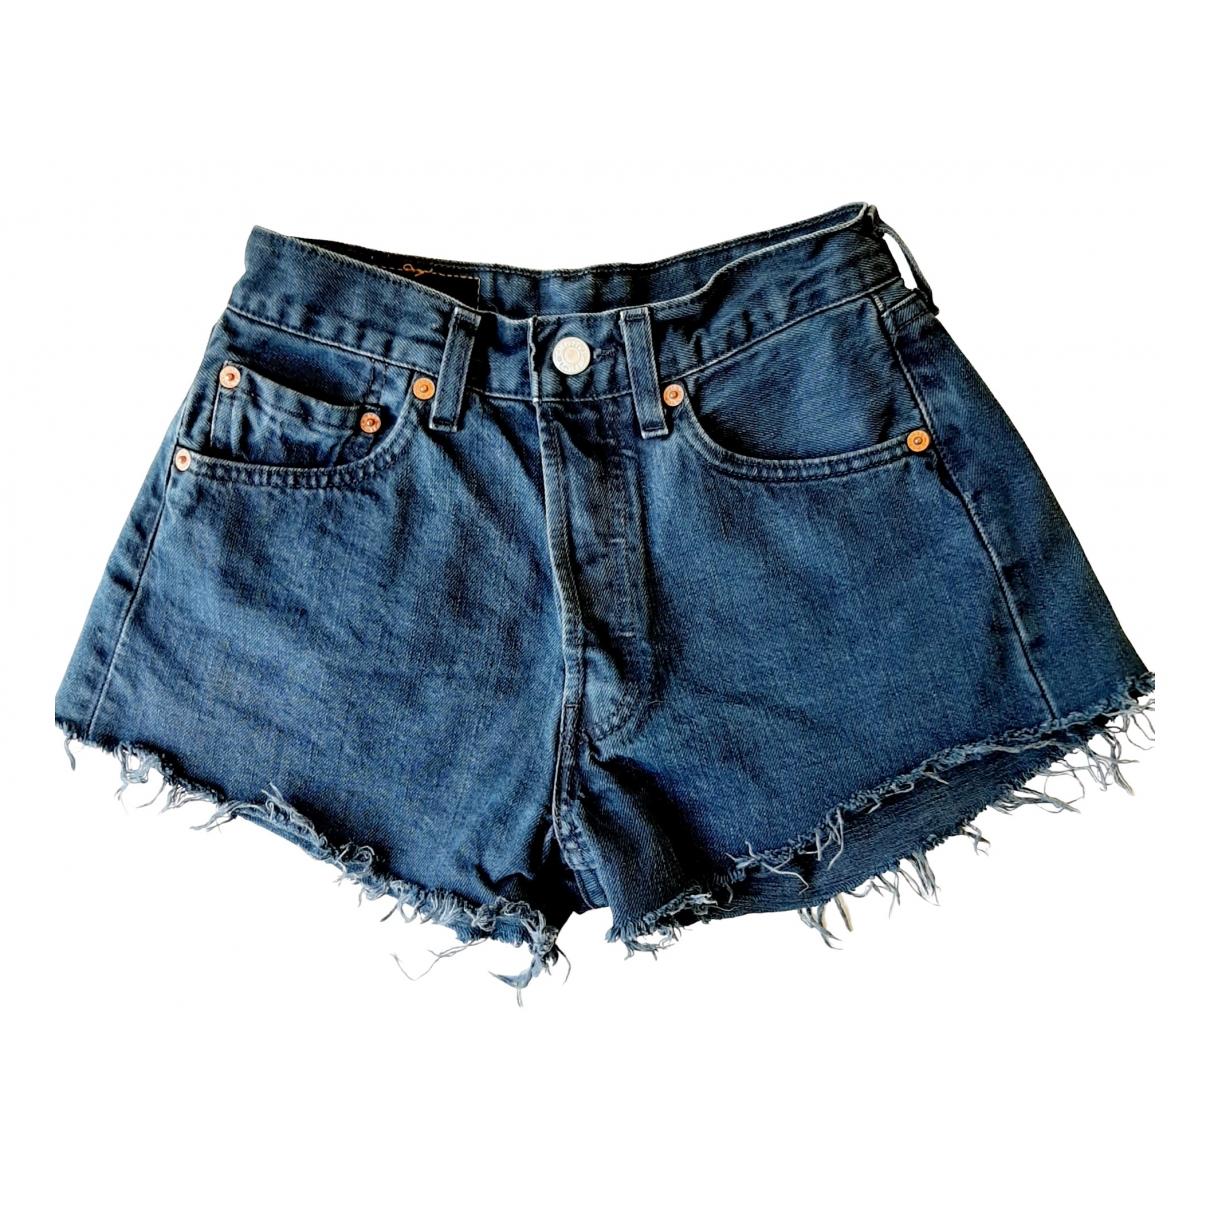 Levi's Vintage Clothing \N Blue Denim - Jeans Shorts for Women XS International